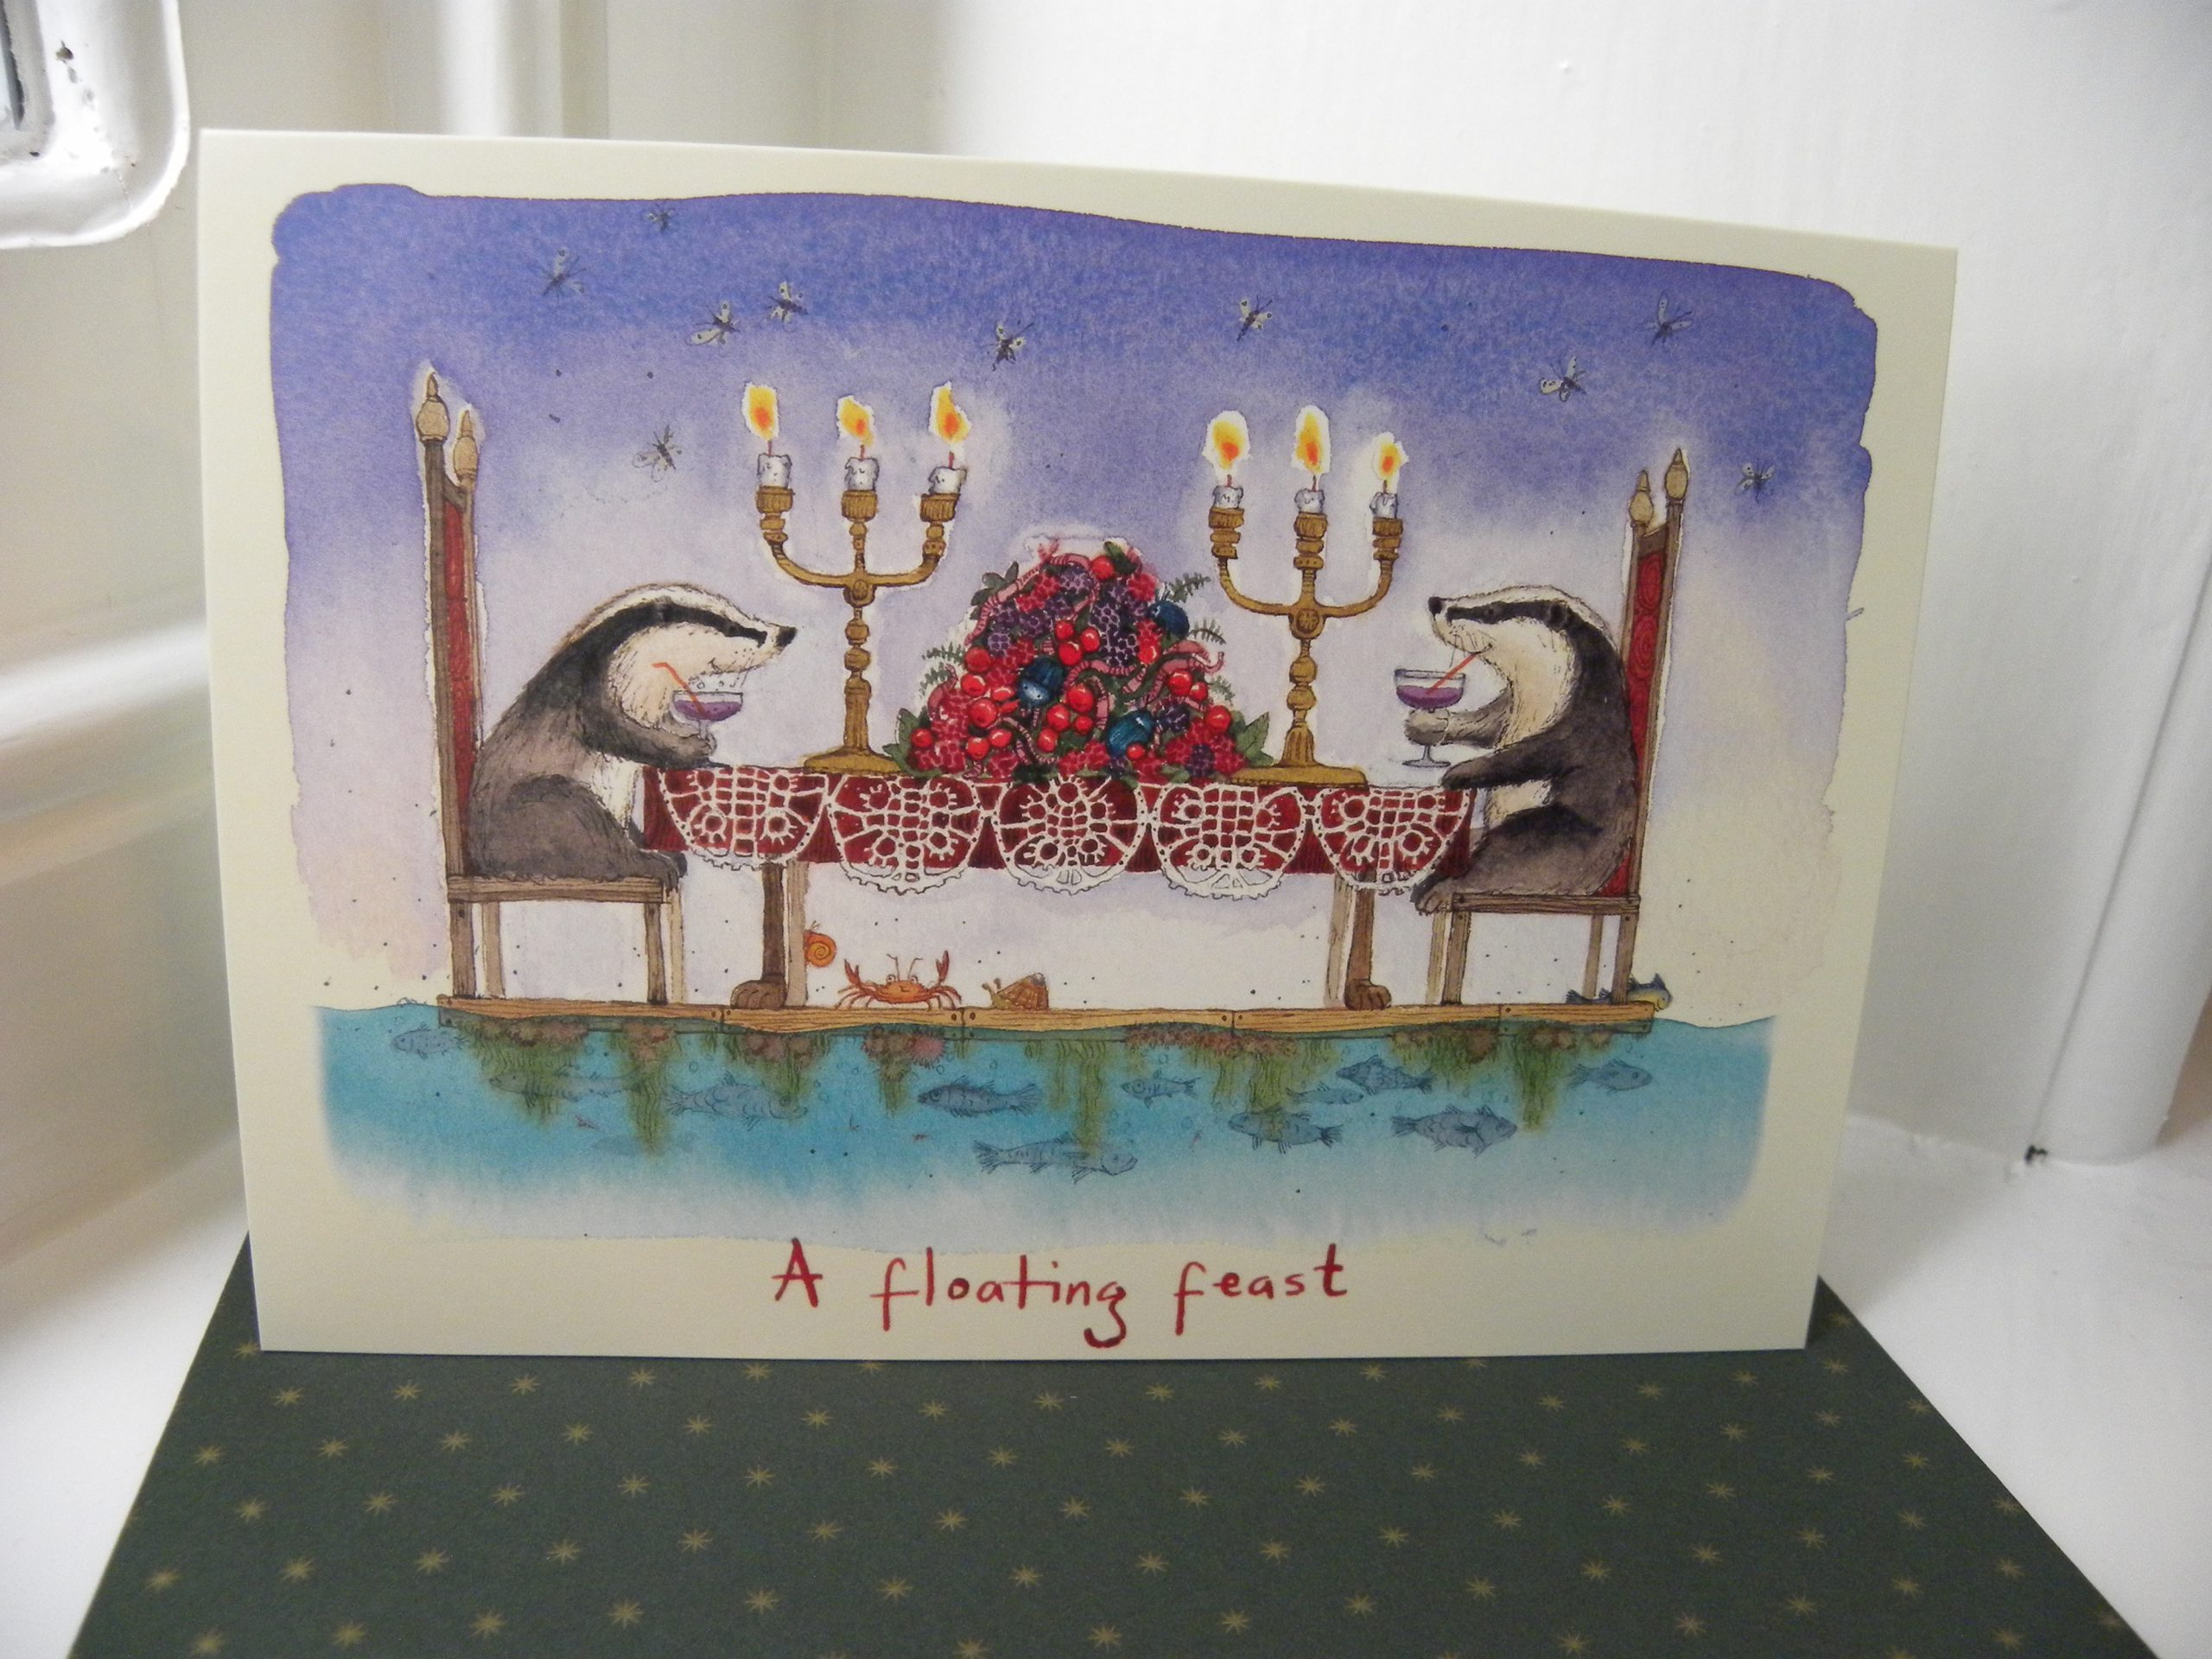 Badger Christmas Card - A Floating Feast